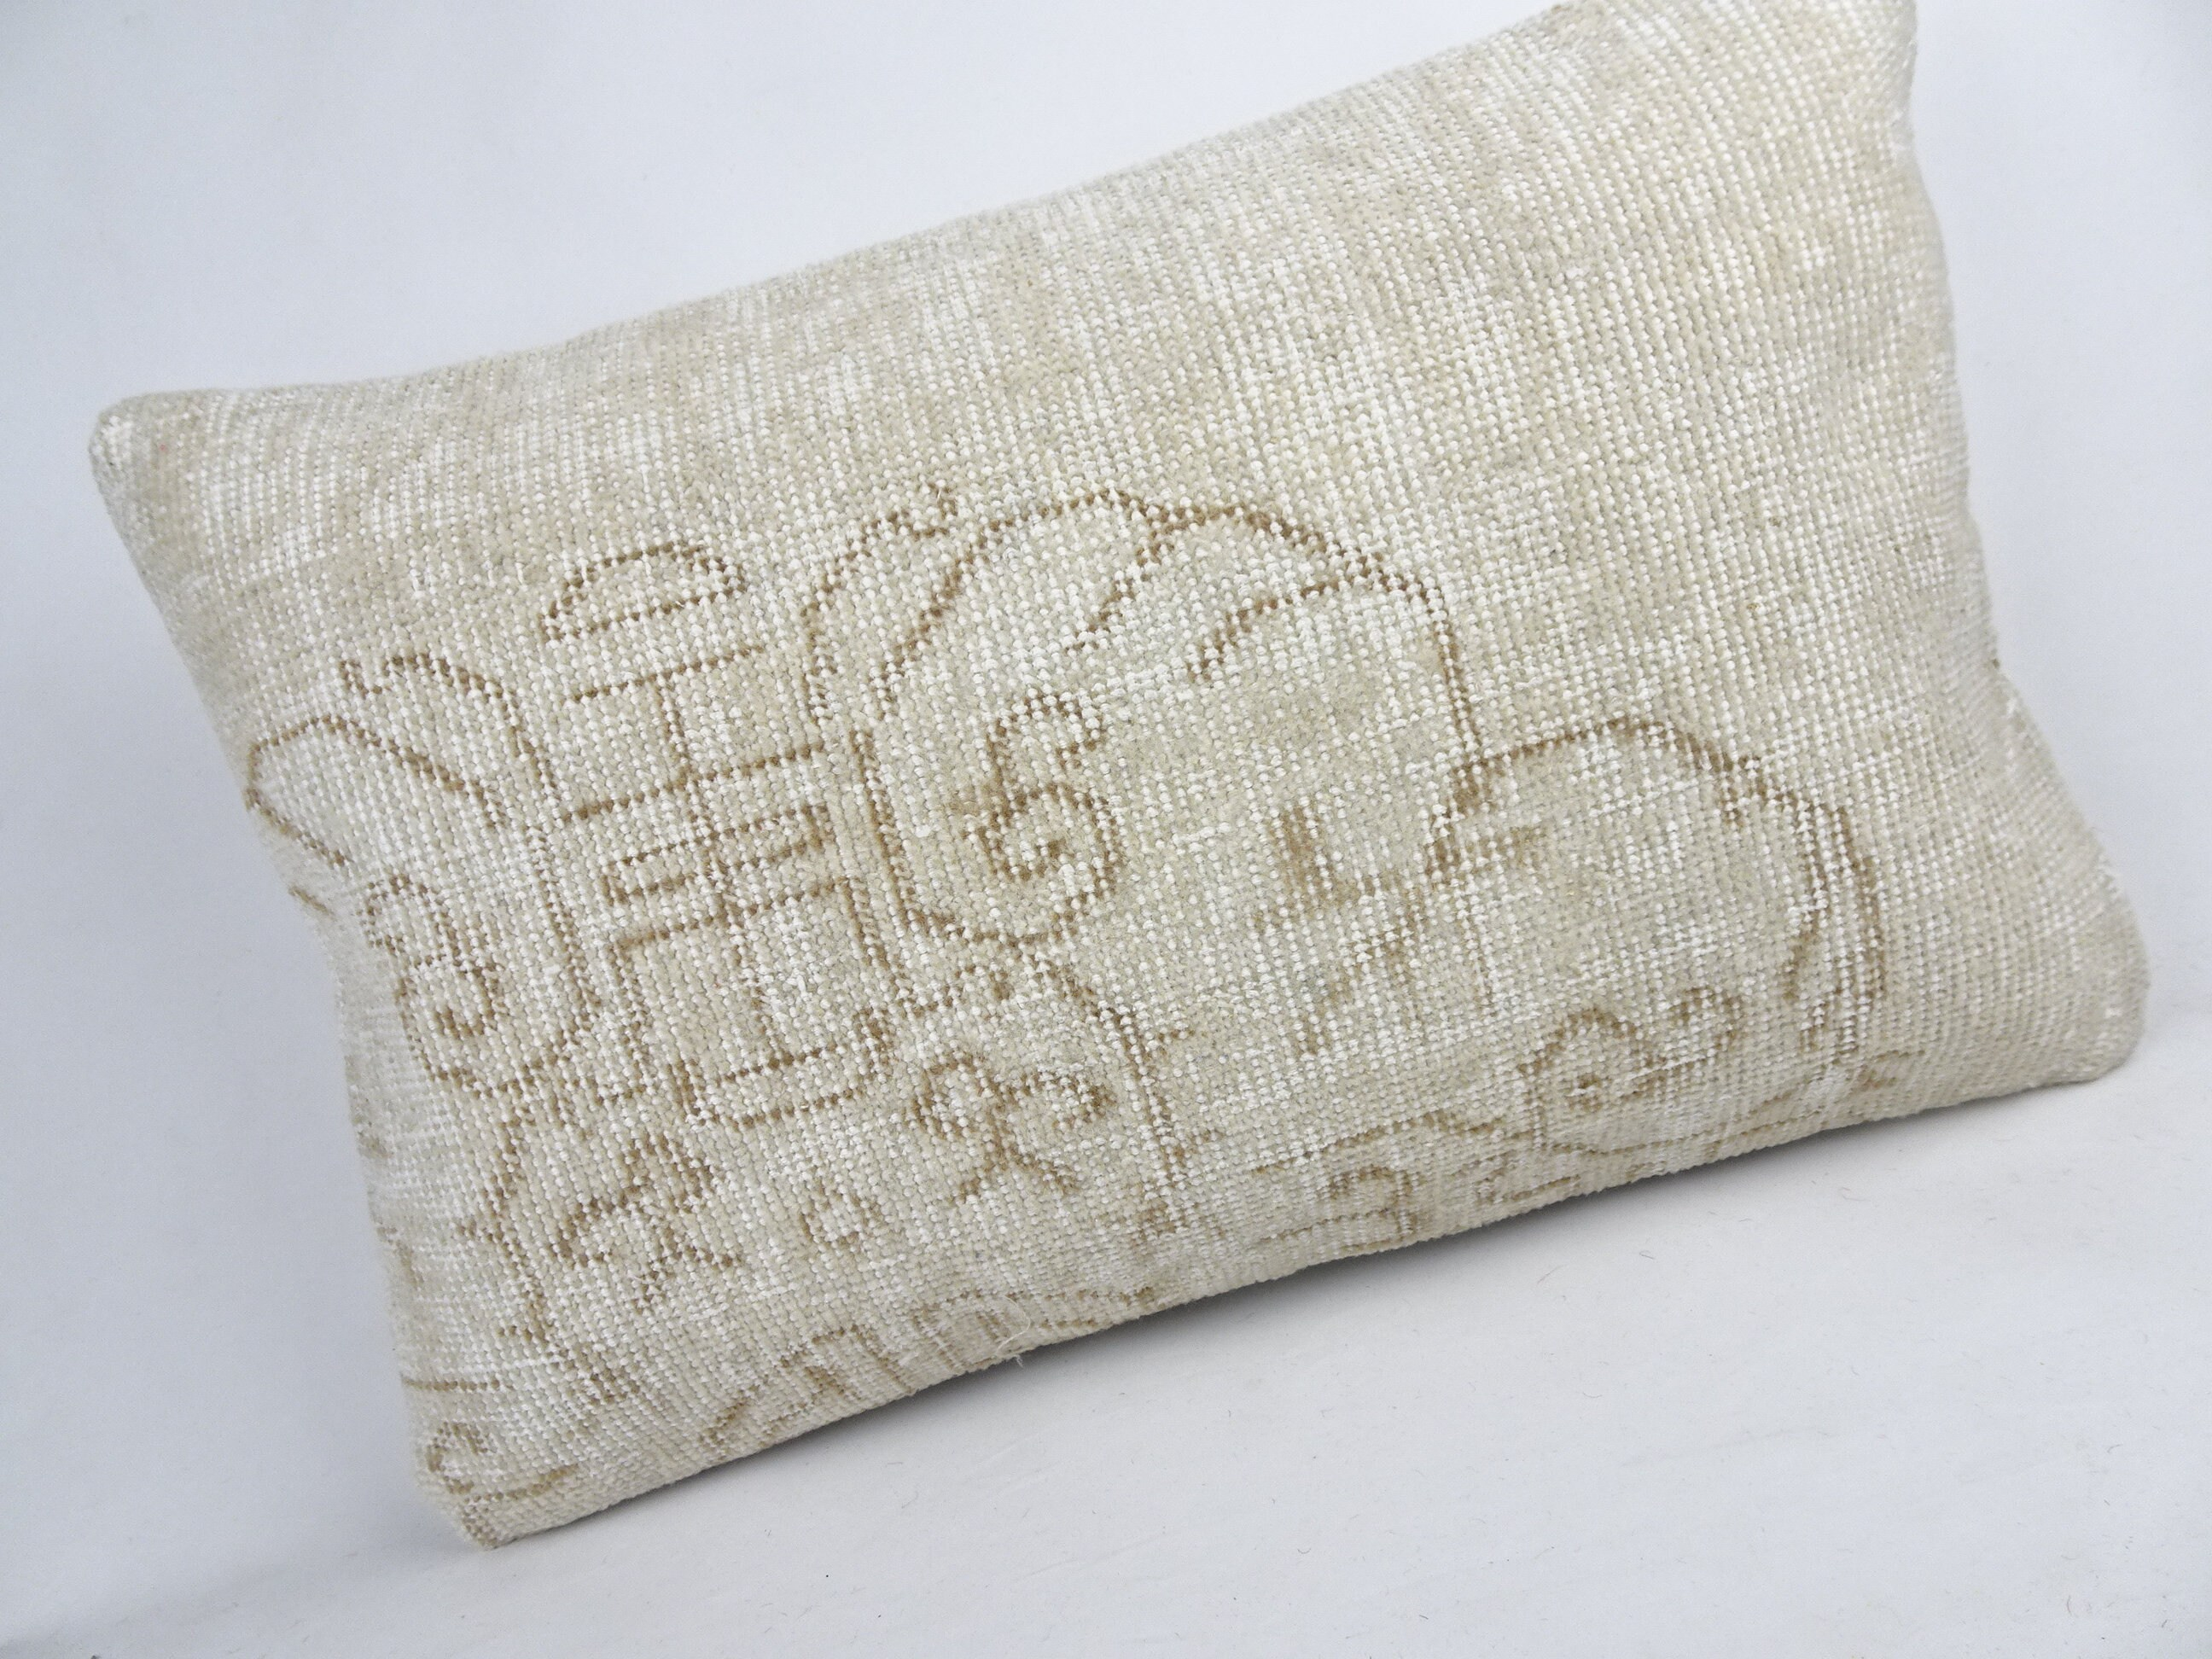 Oushak Rug Pillow,24x16 inch 60x40 Cm Turkish Carpet Pillow,Turkish Handmade Pillow,Lumbar Pillow Cover,Bohemian Decorative Carpet Pillow.